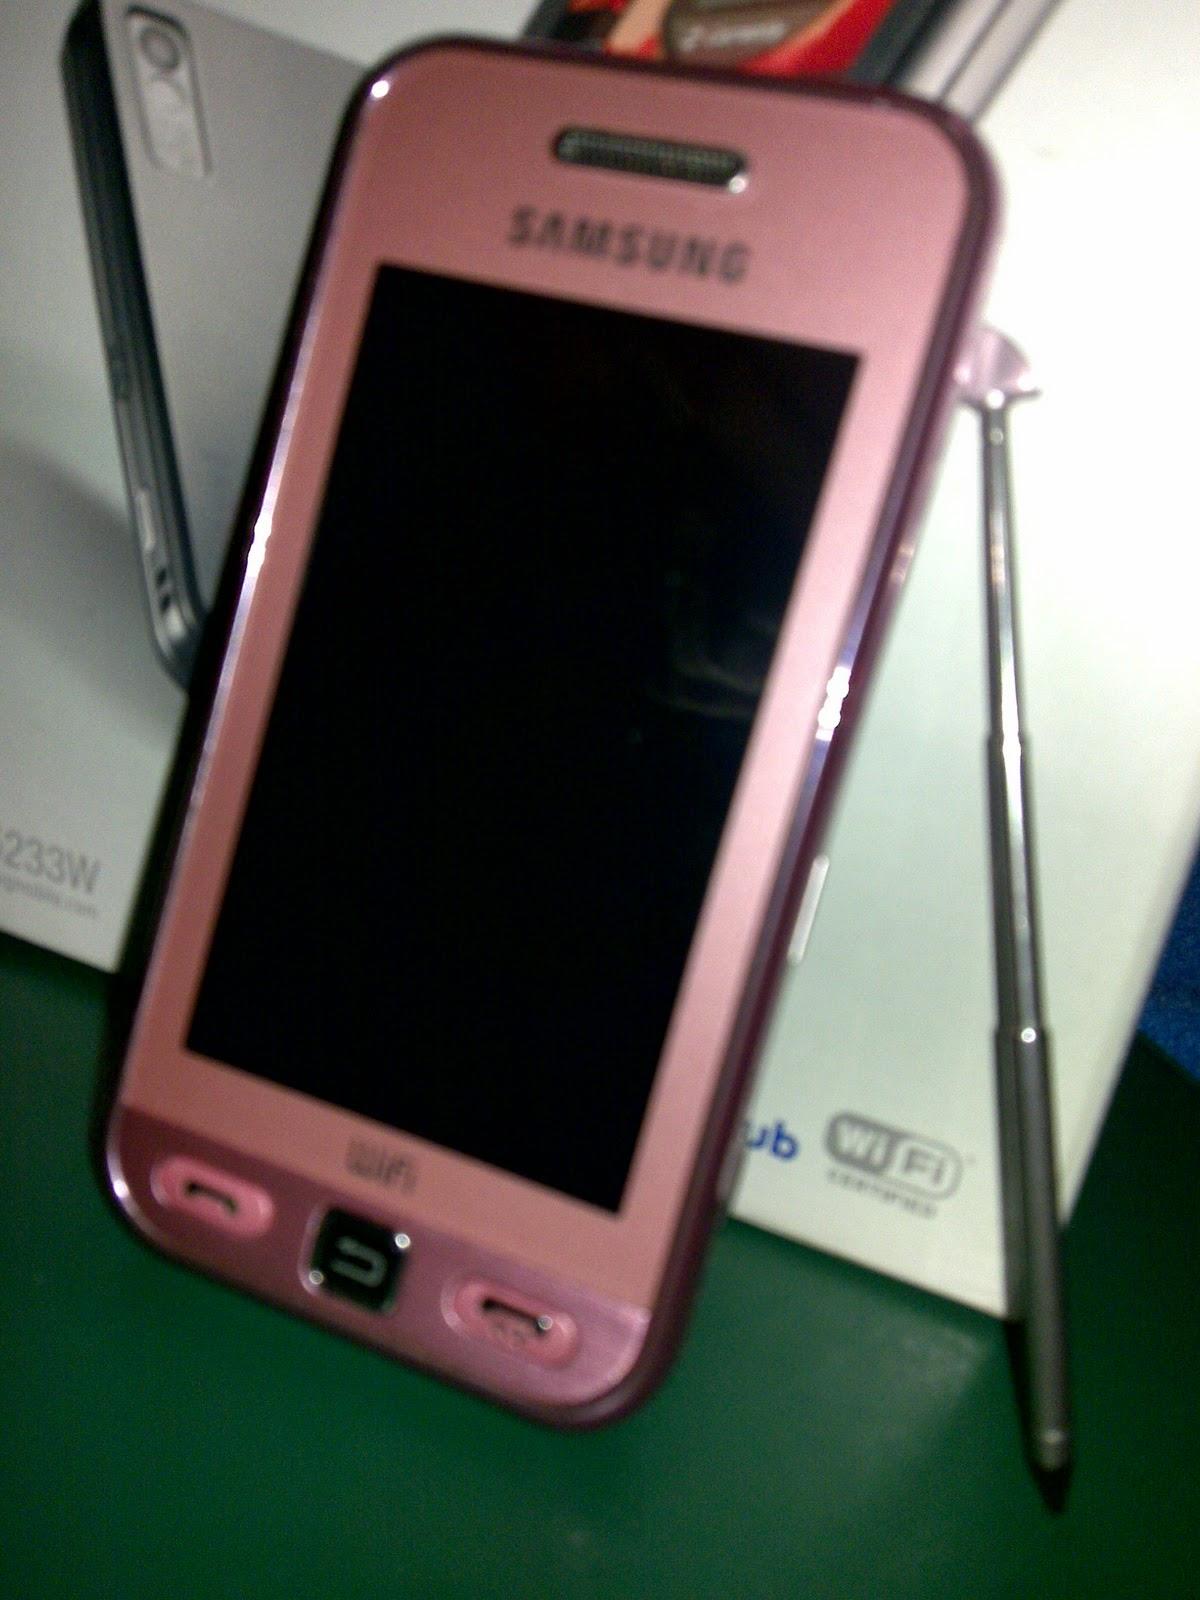 msn mobile samsung gt-s5233w